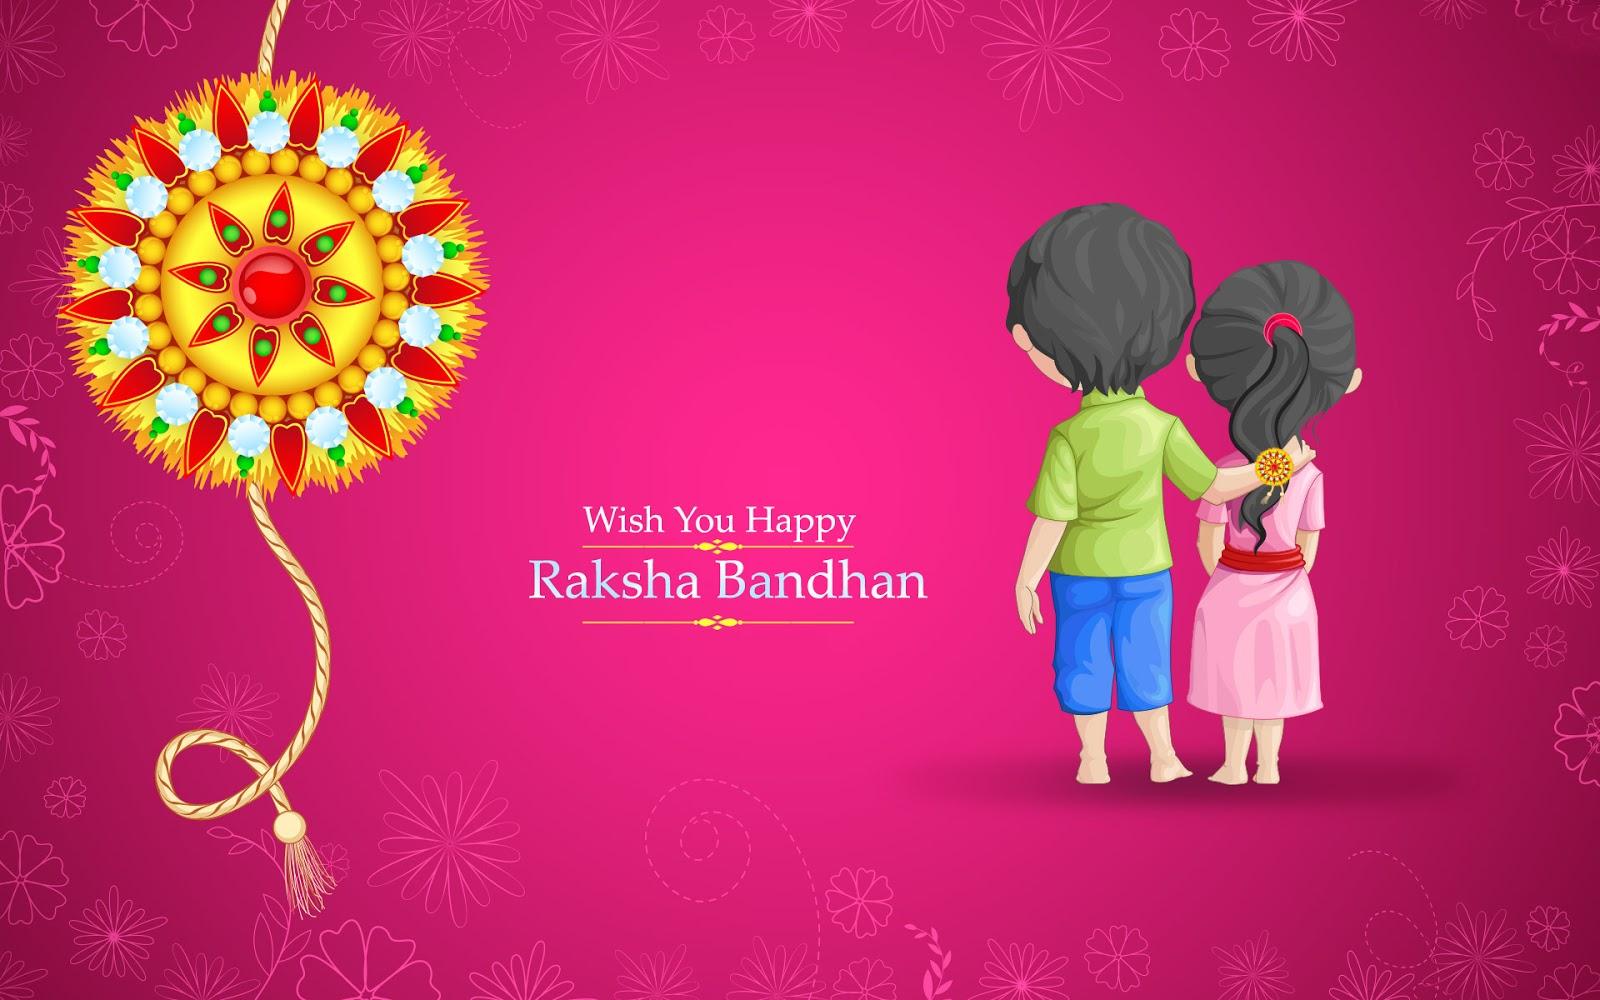 Rakhi Festival Quotes Brother: David Victor Vector: Raksha Bandhan